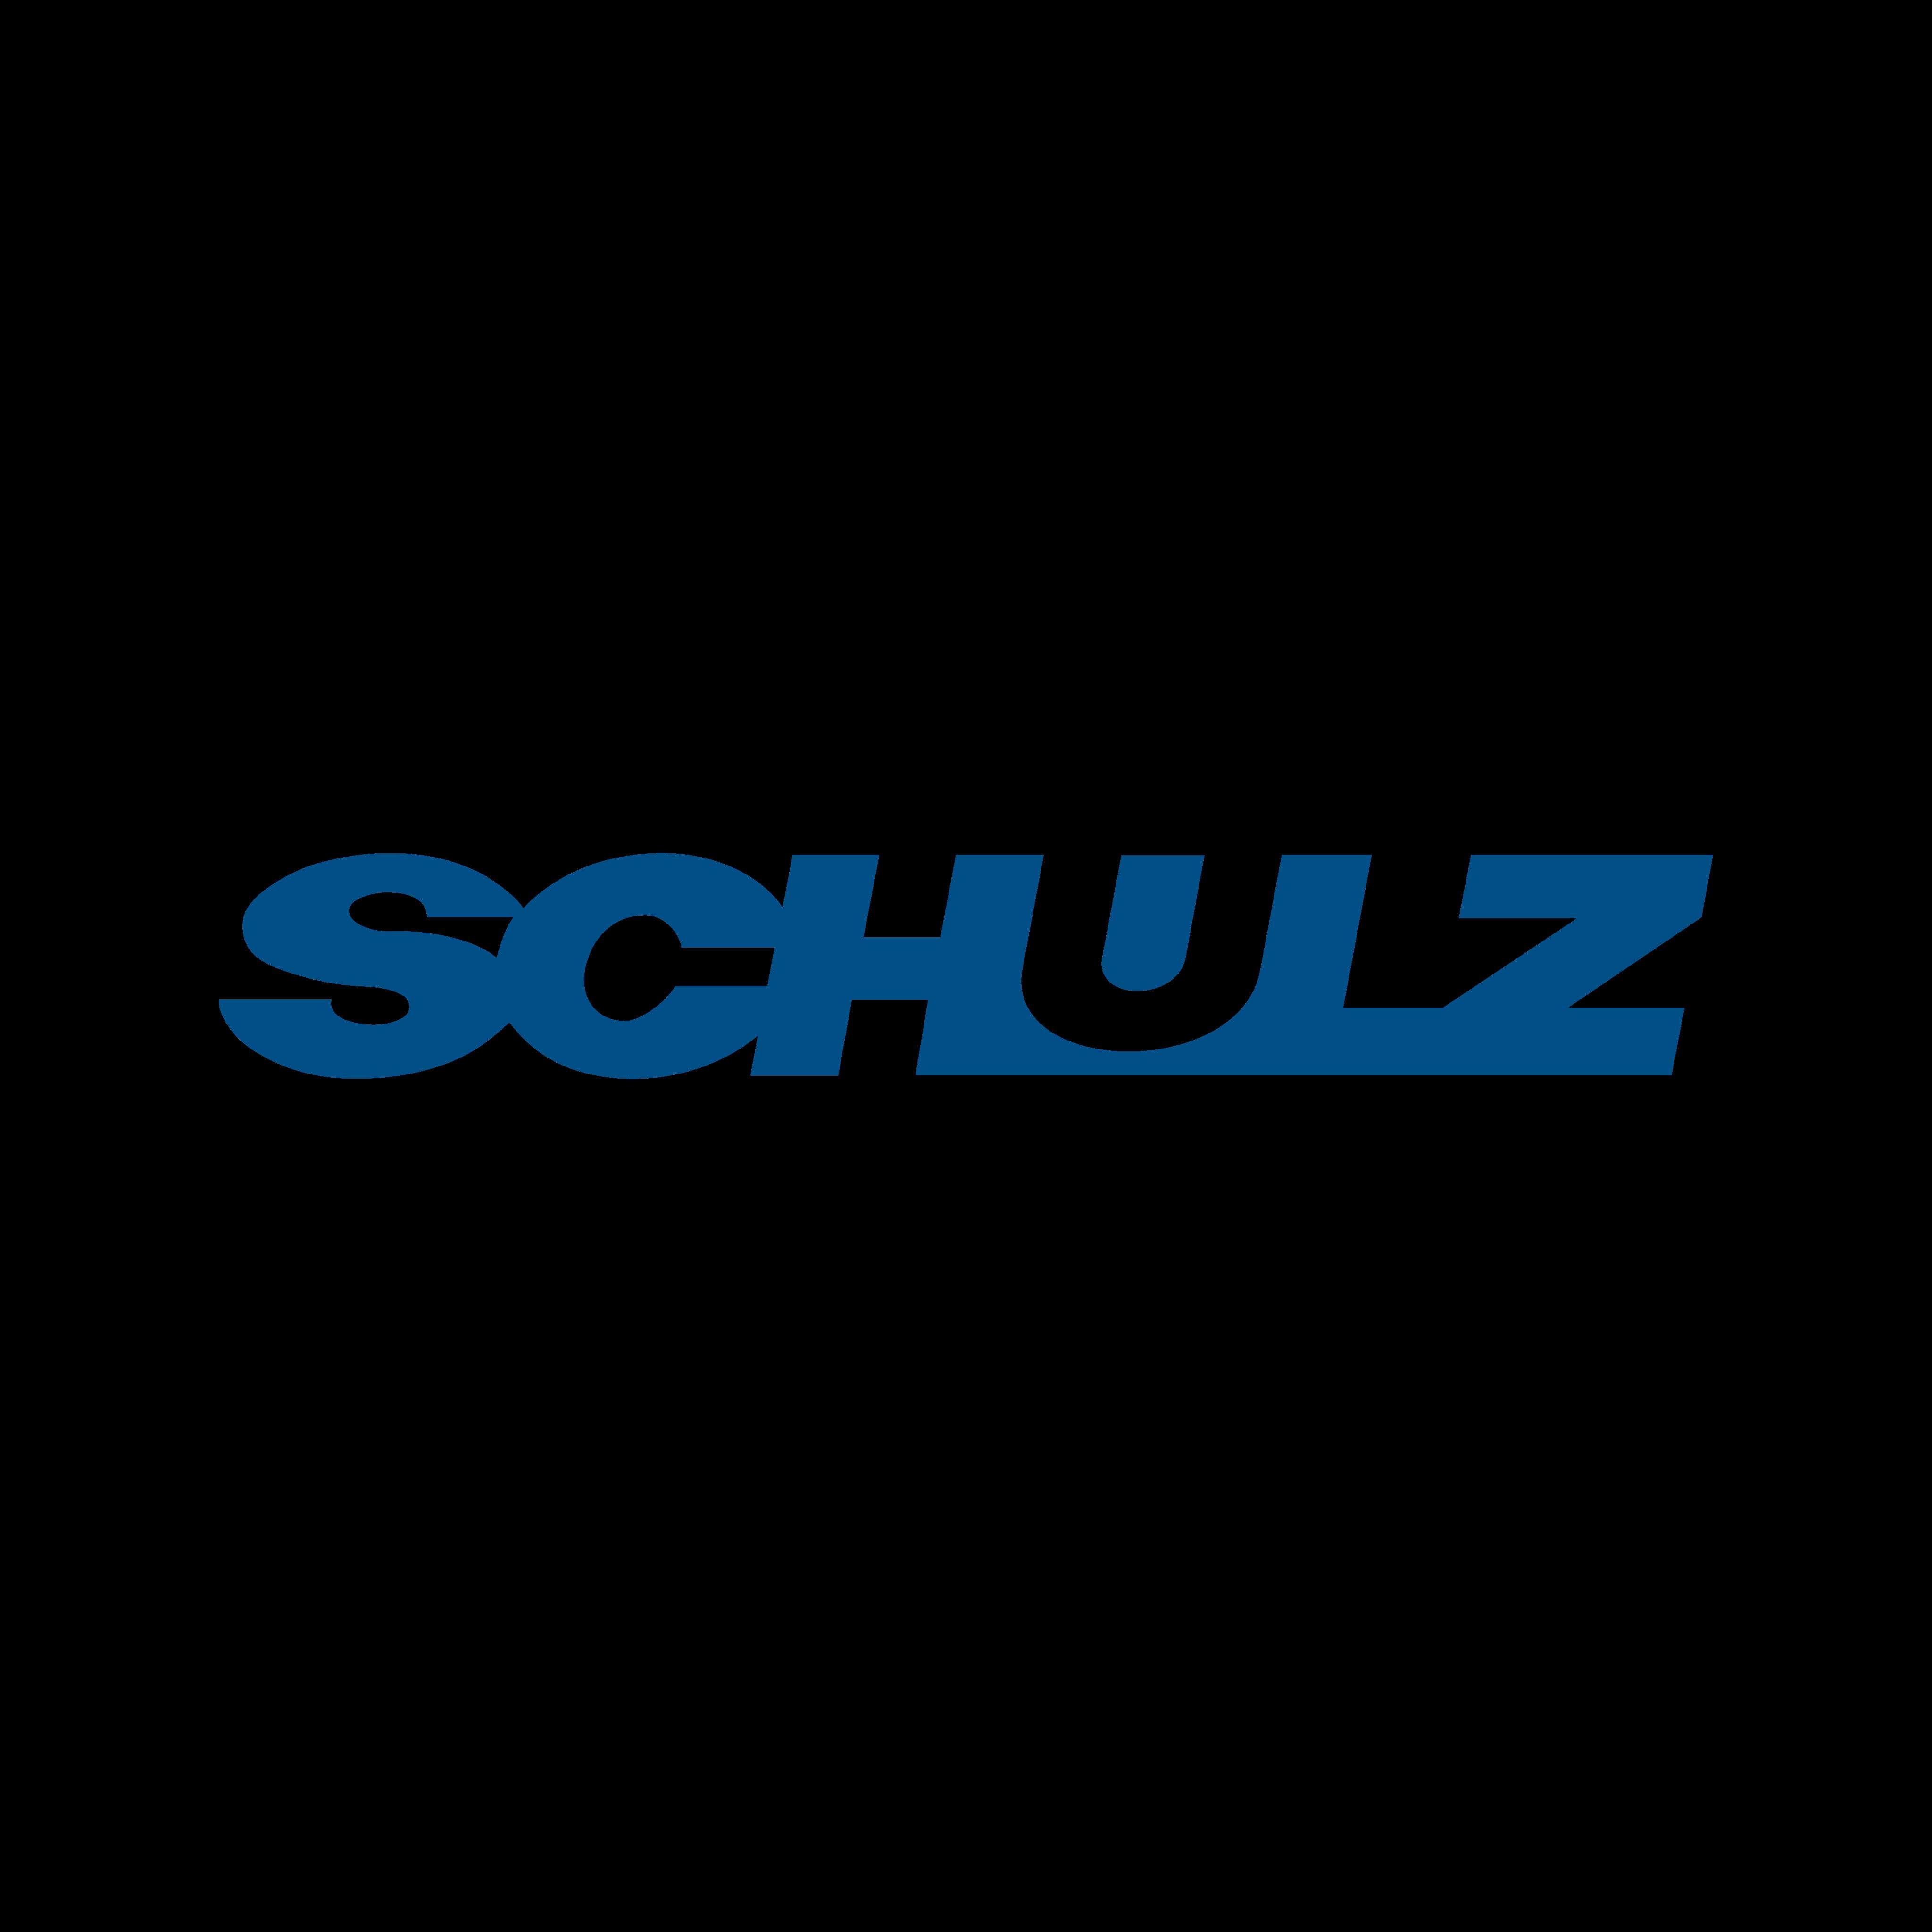 schulz logo 0 - SCHULZ Logo